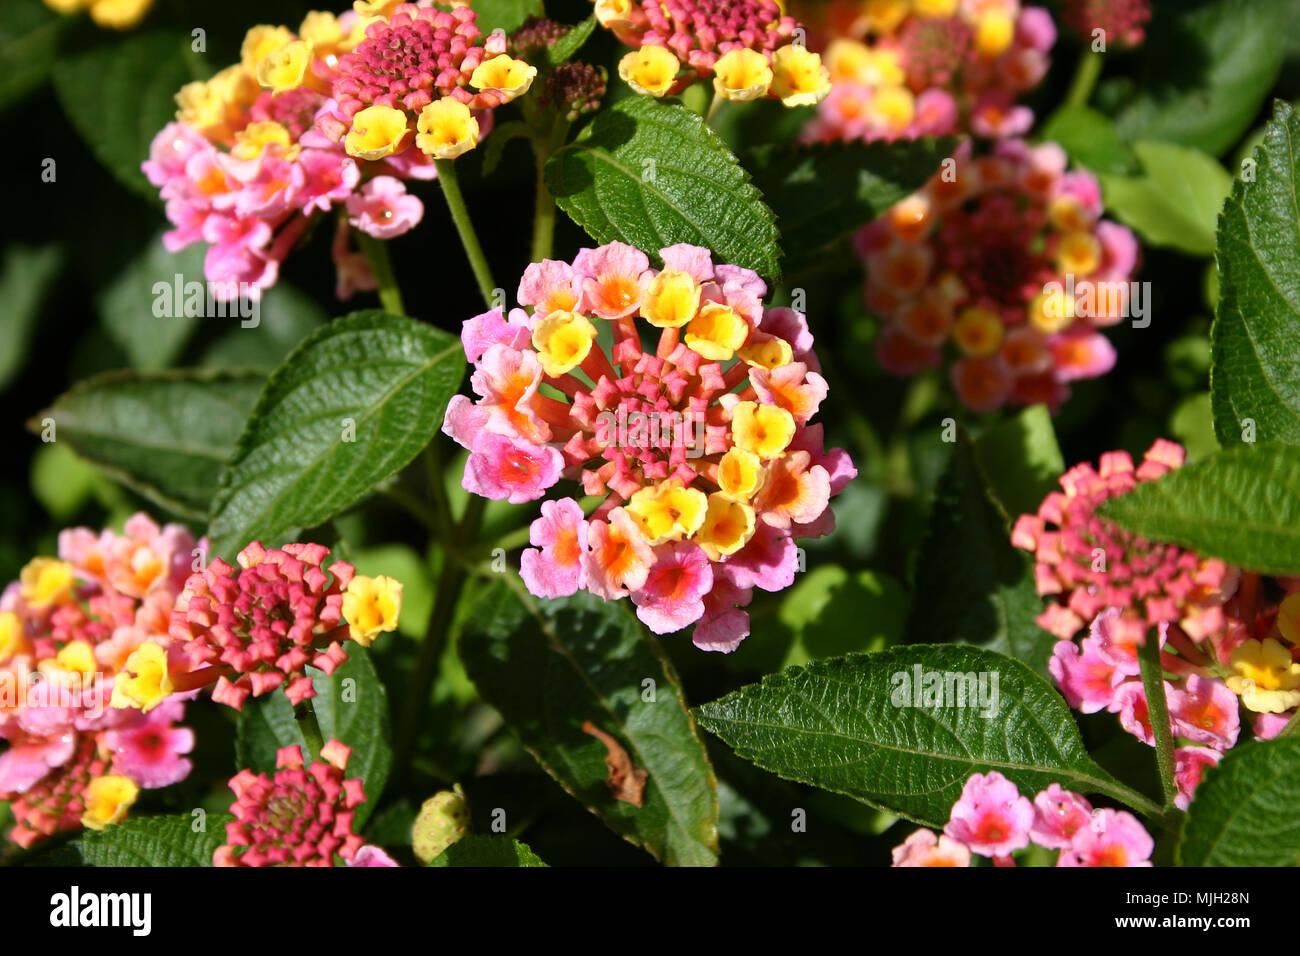 Pink And Yellow Lantana Flowers Stock Photo 183542485 Alamy